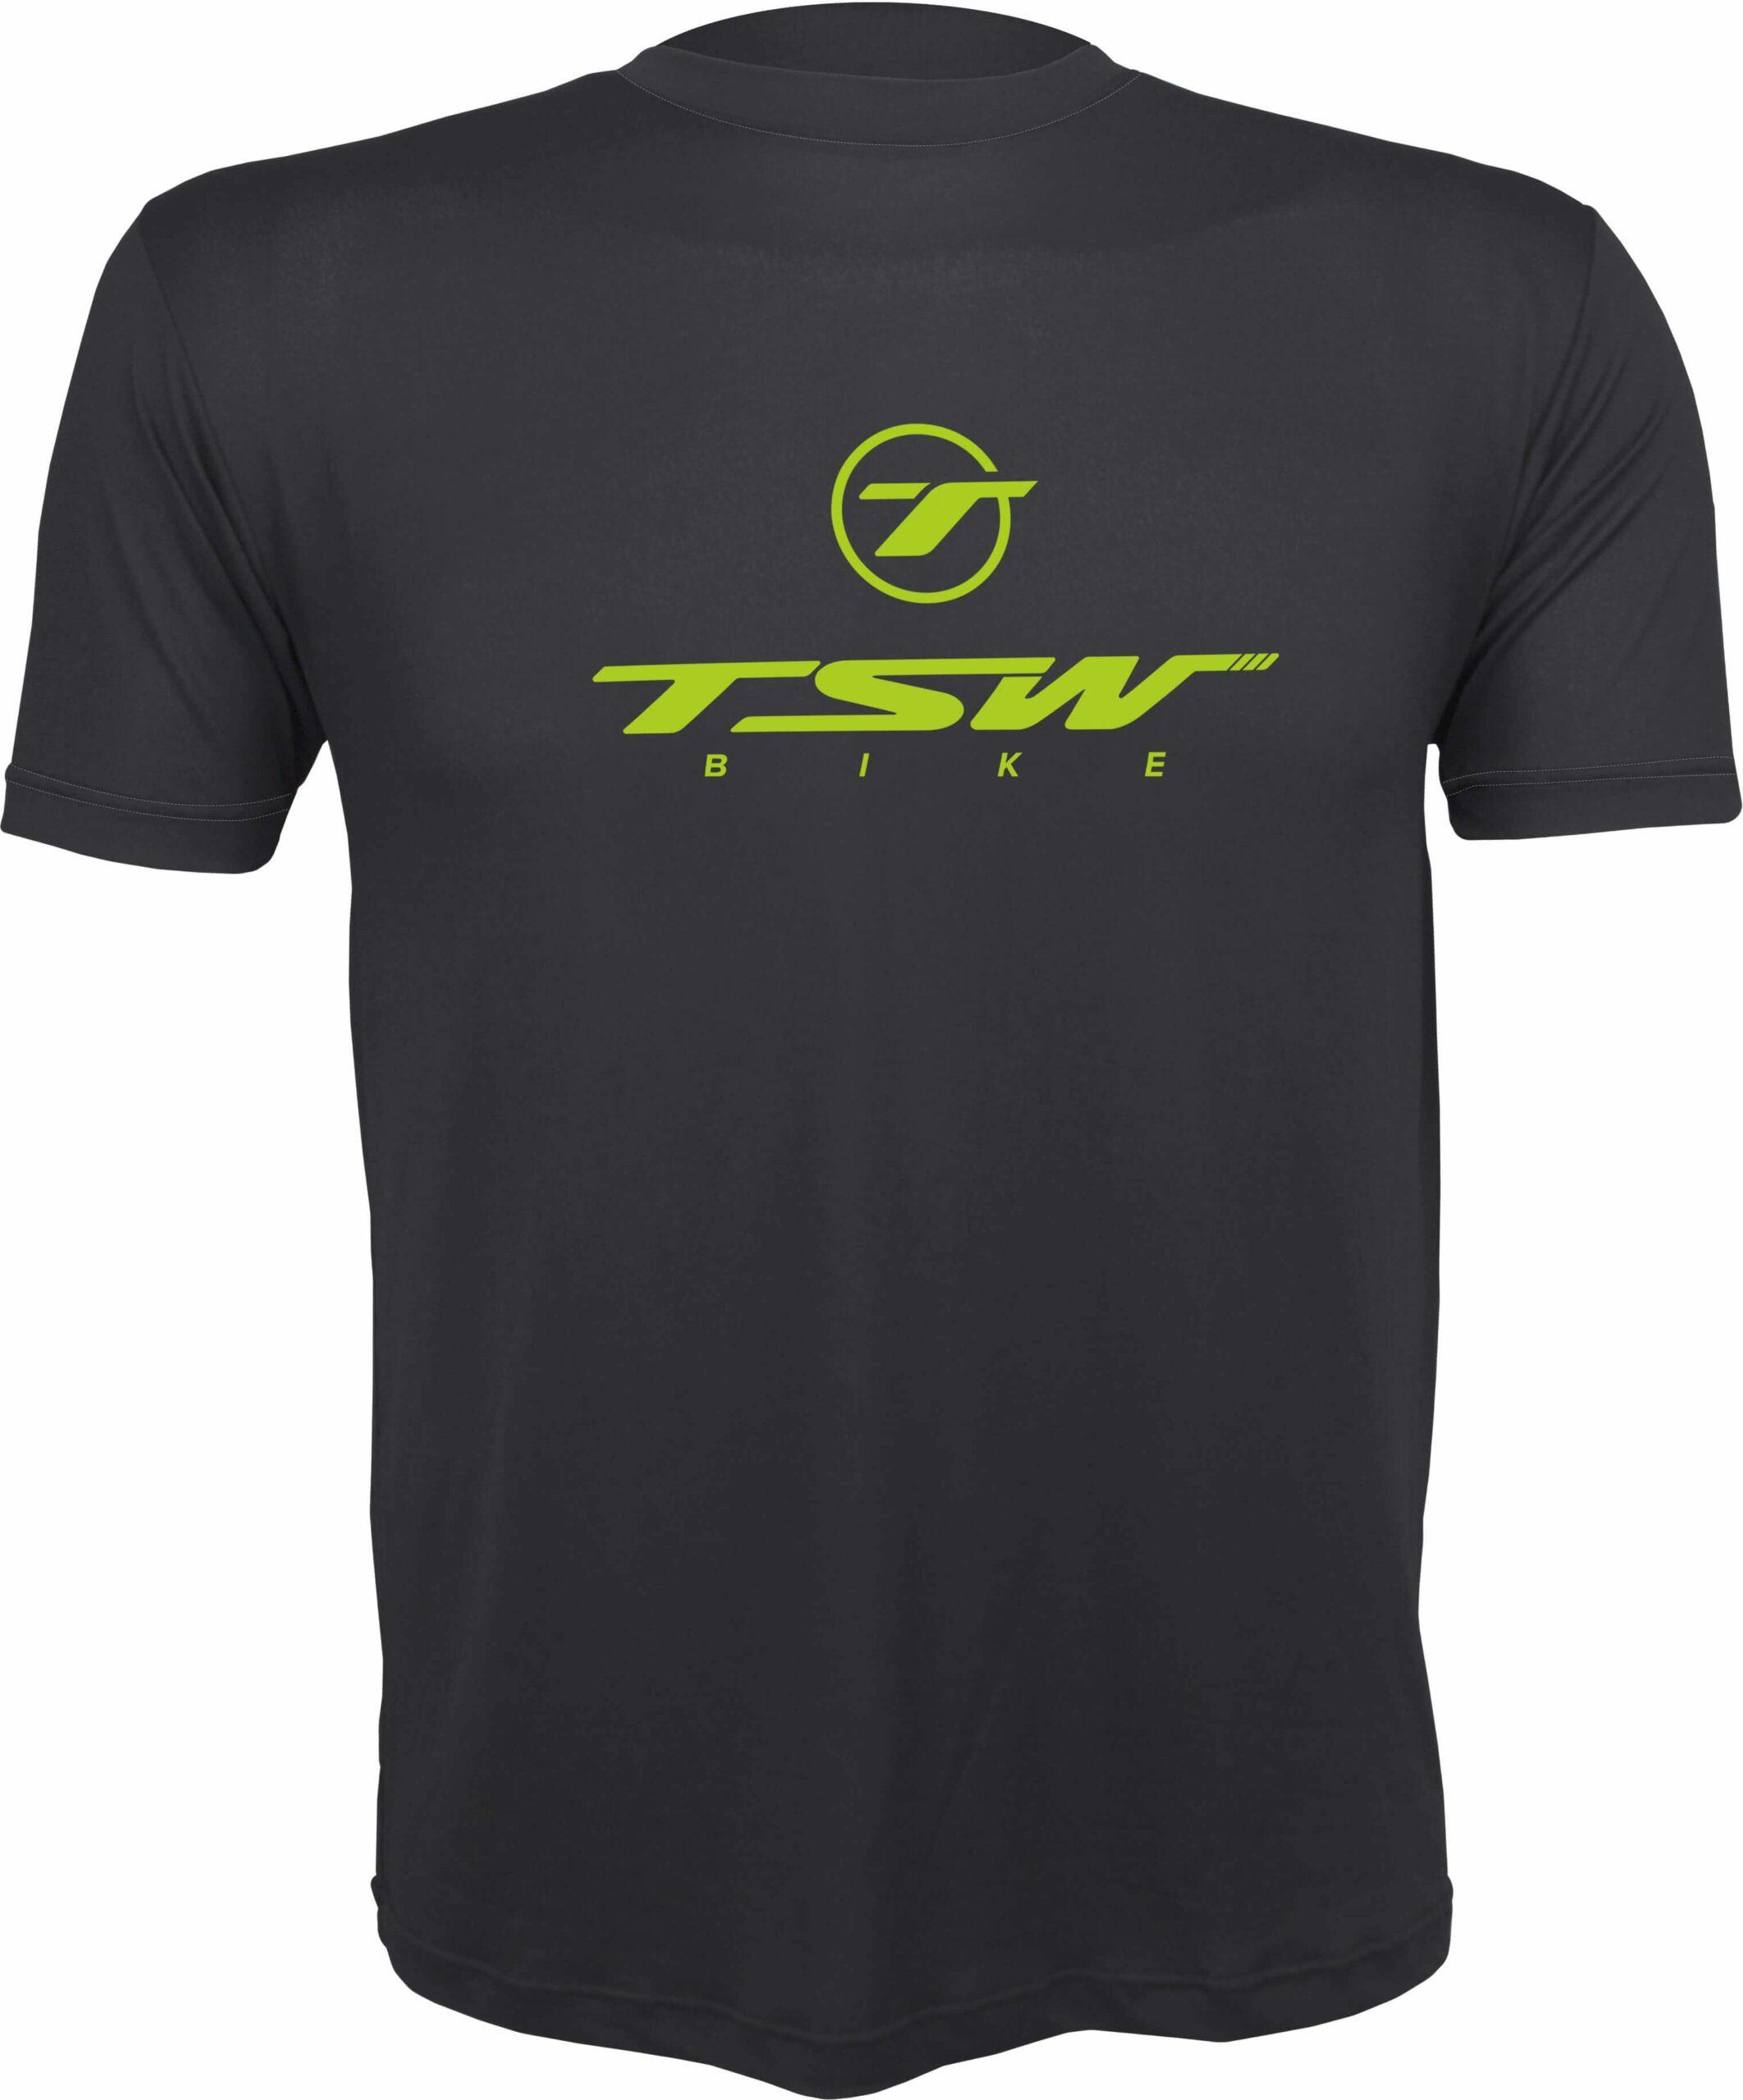 Camisa T-Dry | Cinza chumbo/Cores 8